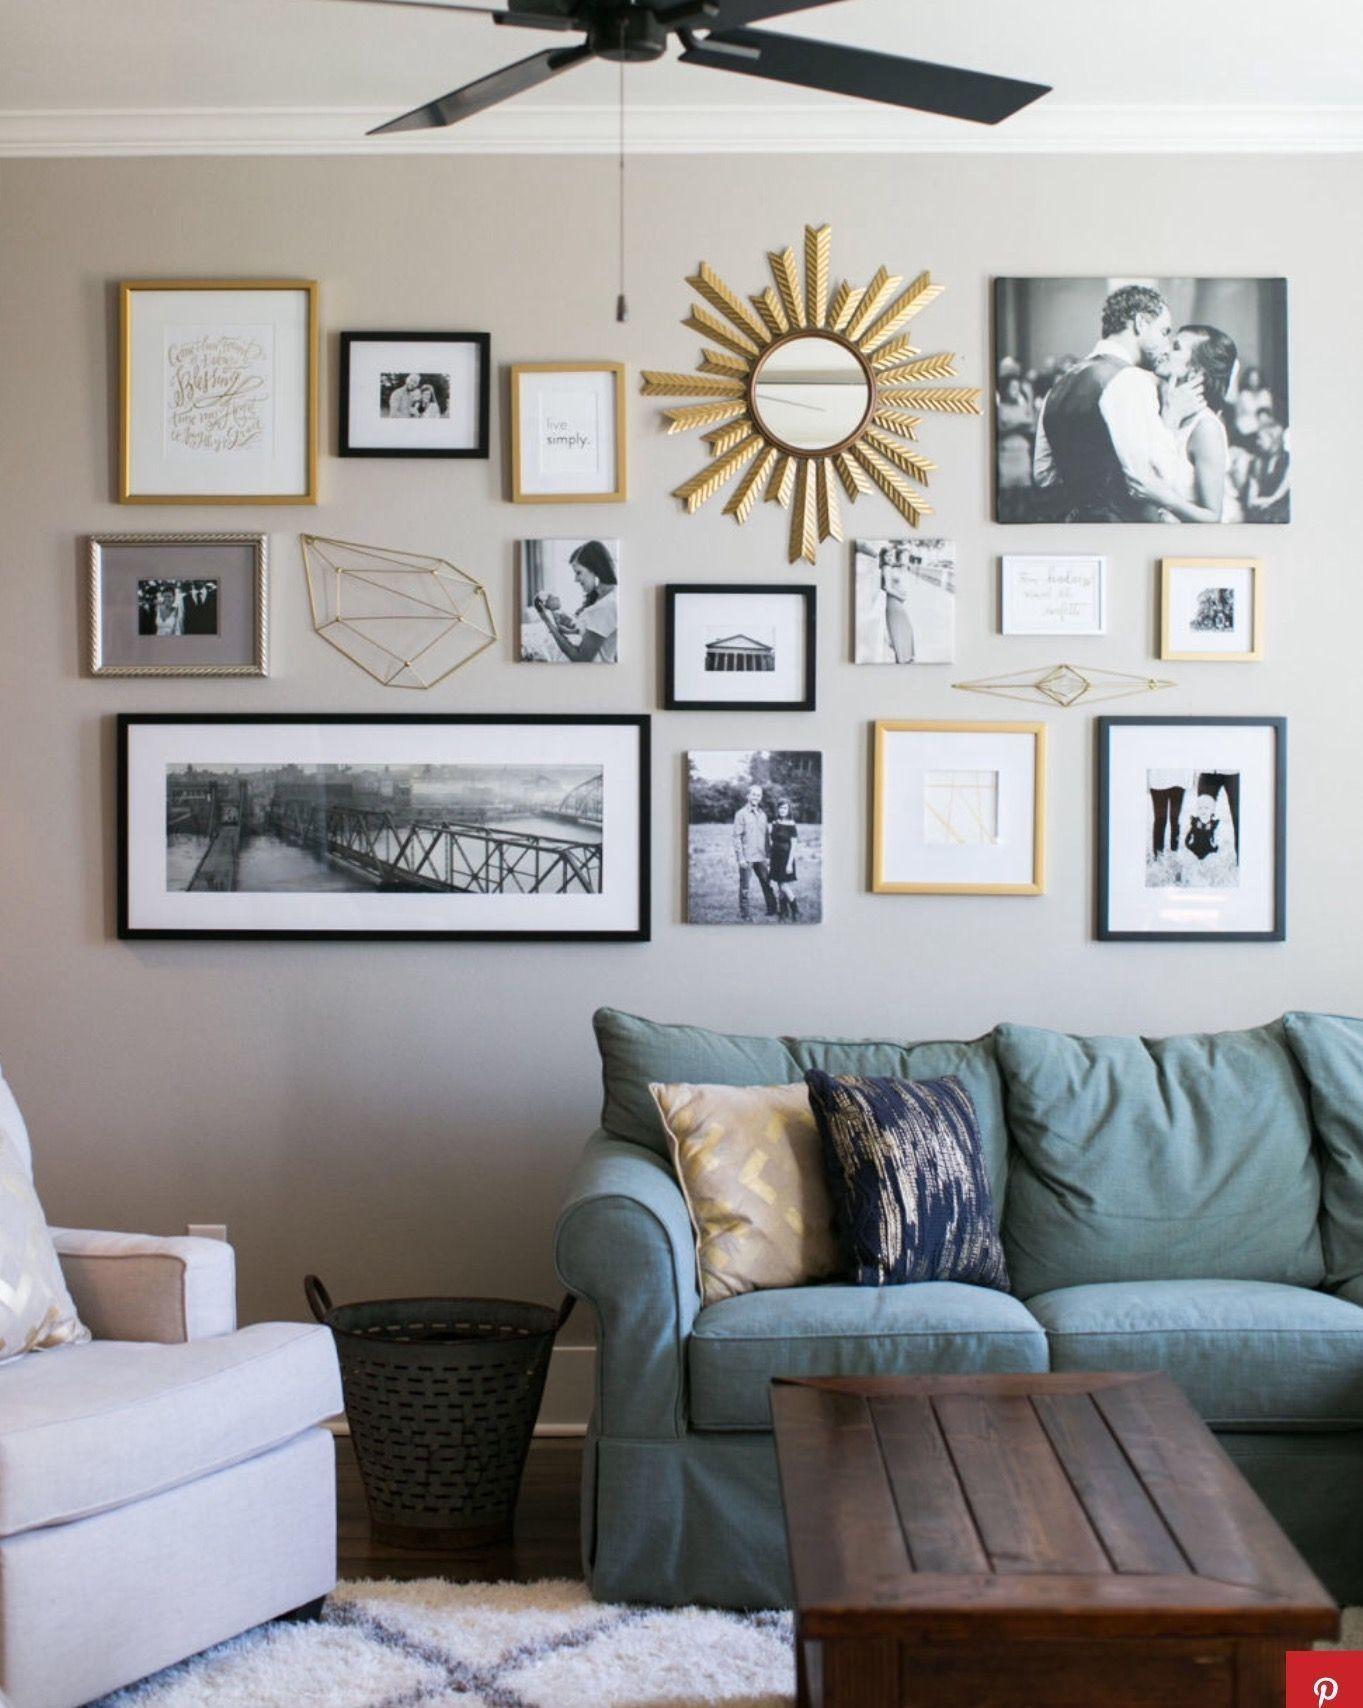 Cool 18 Farmhouse Wall Ideas for living Room Decor https://homiku